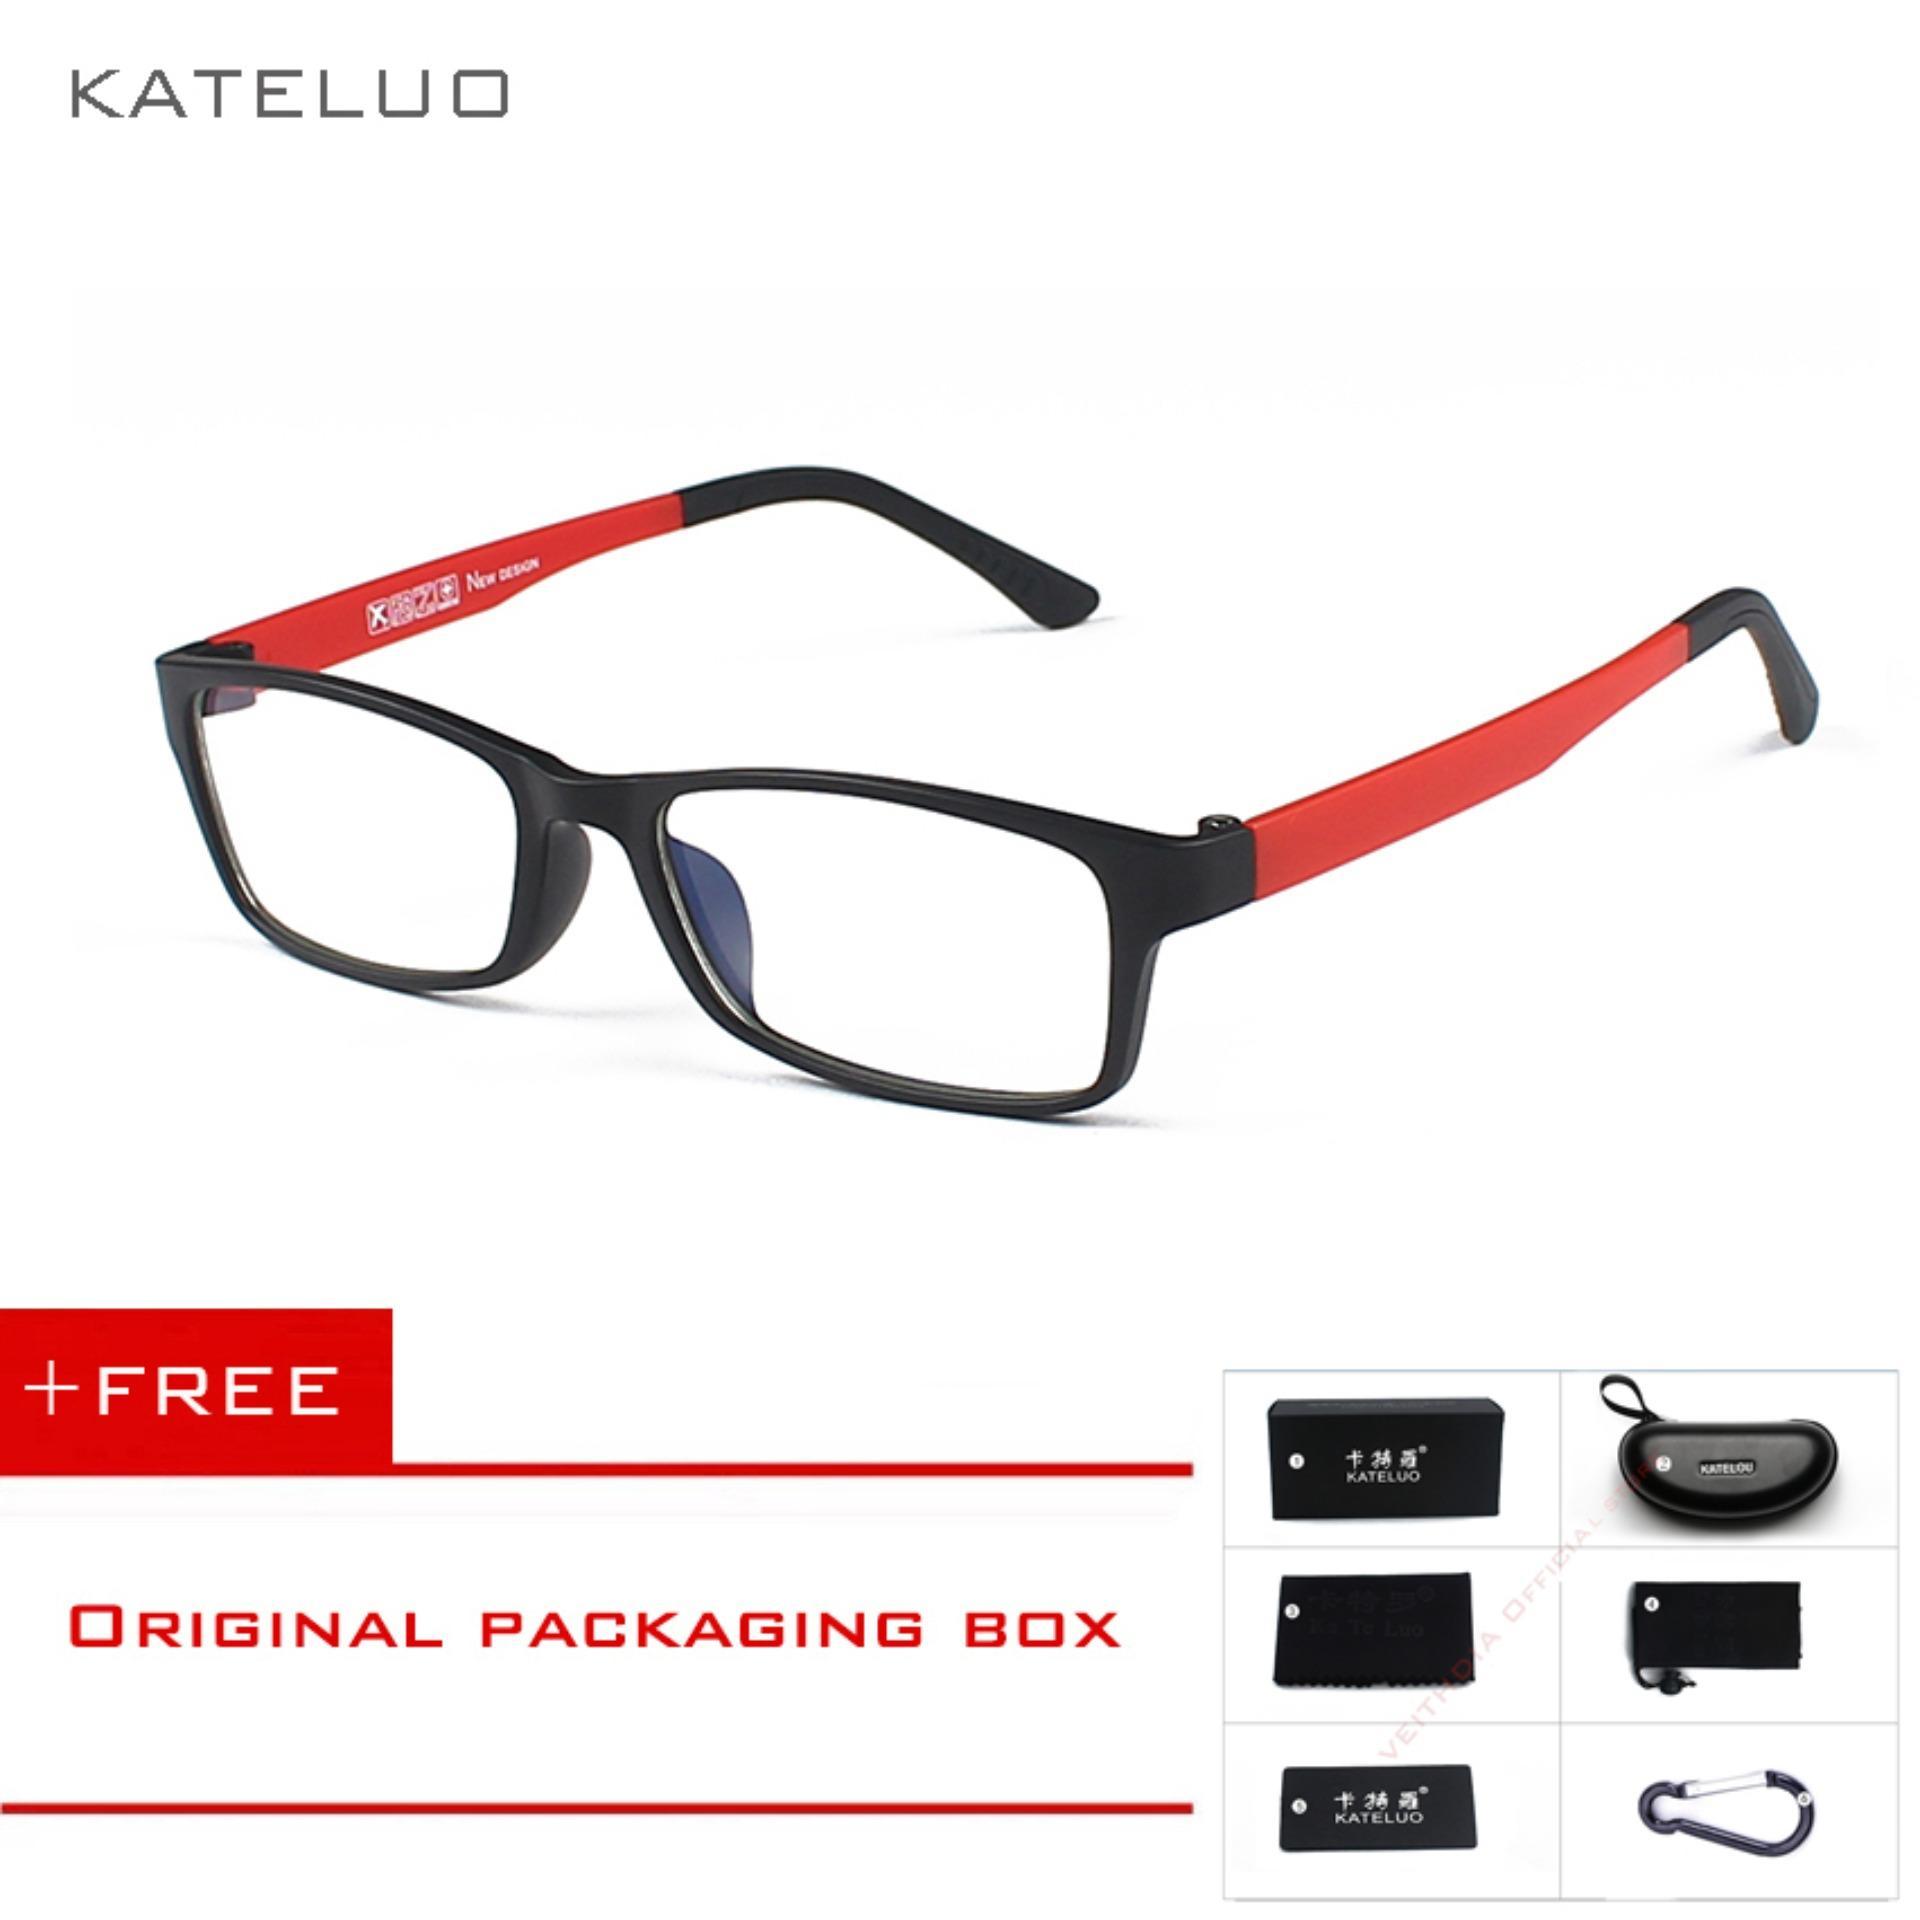 fd784f3065 KATELUO ULTEM(PEI)- Tungsten Computer Goggles Anti Blue Laser Fatigue  Radiation-resistant